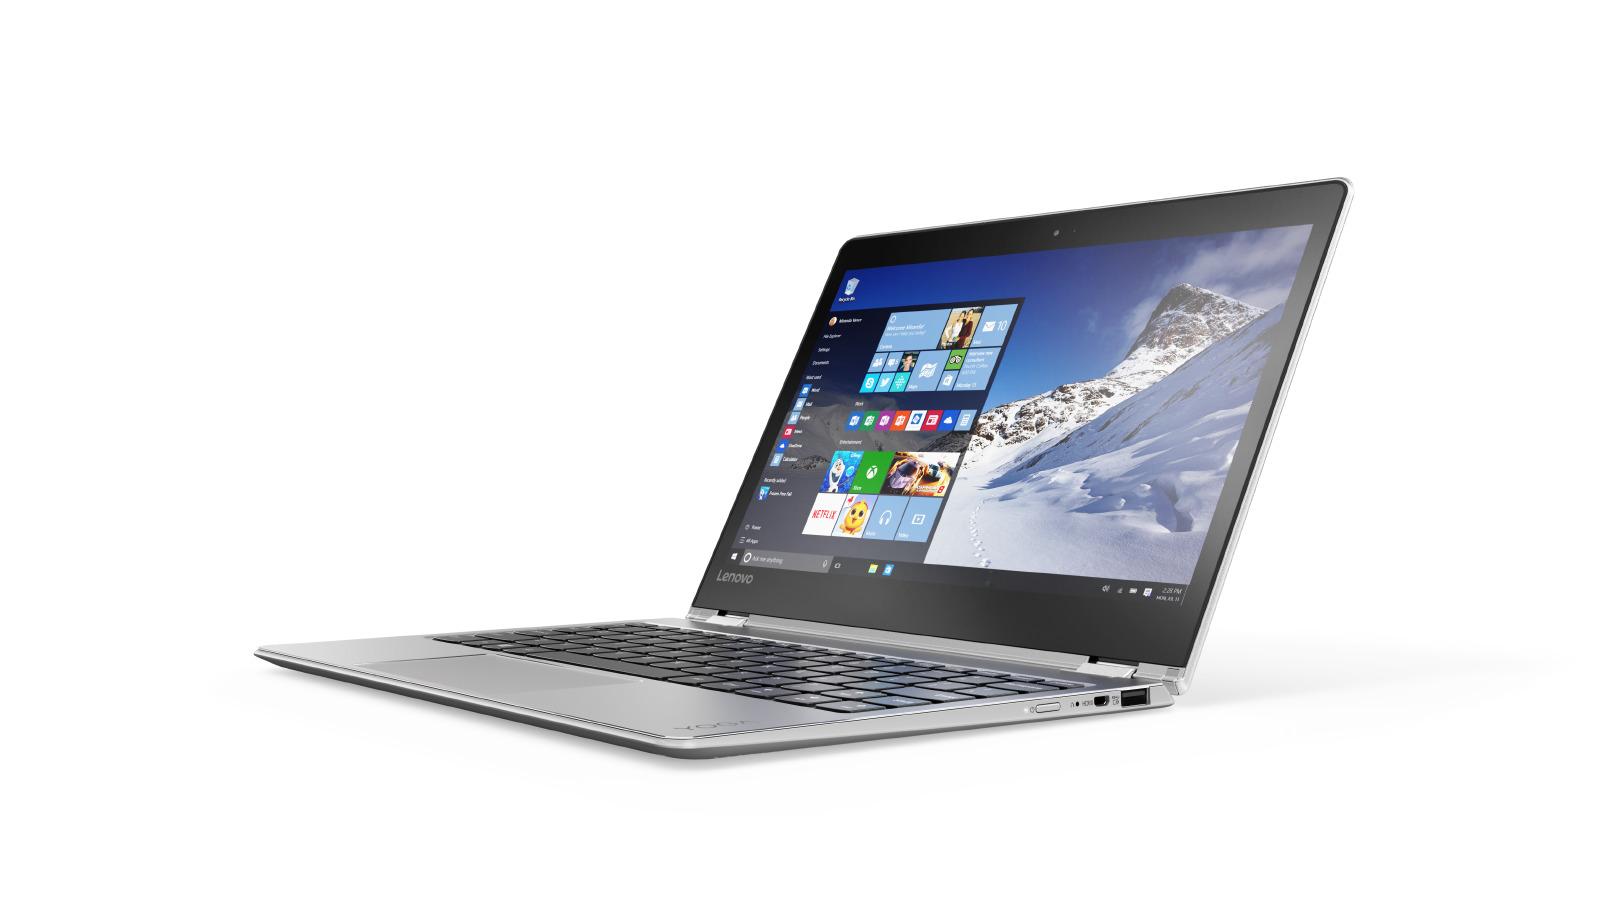 "Lenovo YOGA 710-11IKB Core M3-7Y30 2,60GHz/8GB/SSD 256GB/11,6"" FHD/IPS/multitouch/WIN10 stříbrná 80V60020CK"